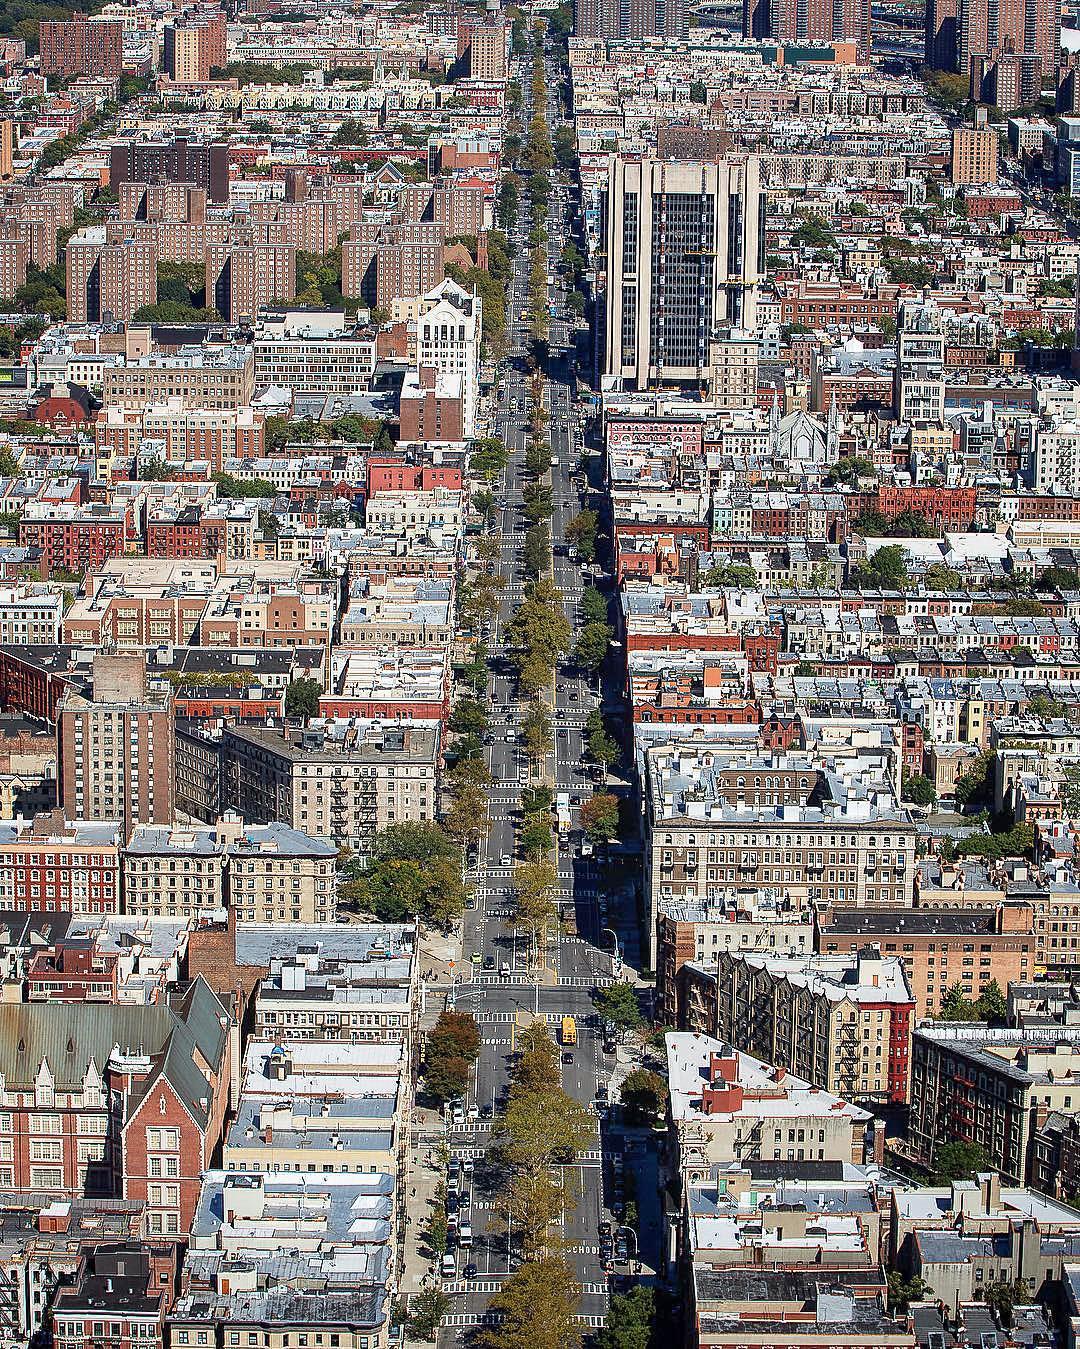 7th avenue.jpg